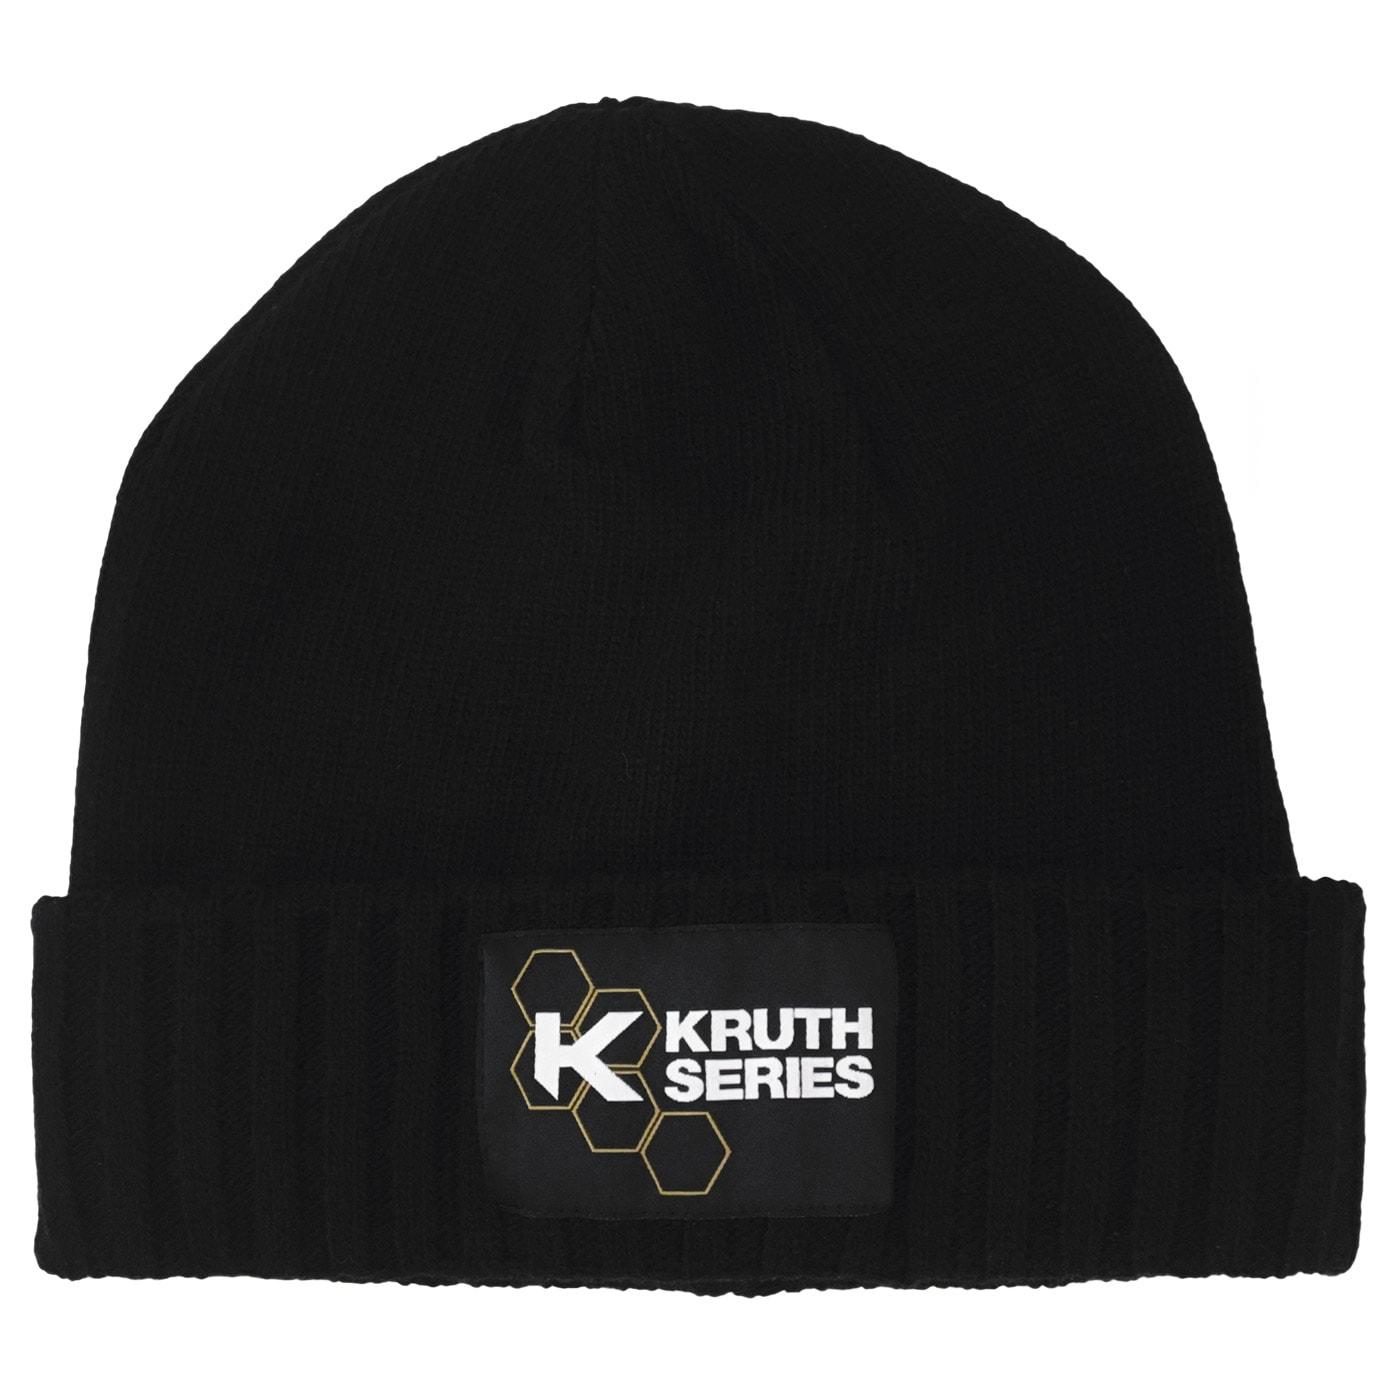 Kruth Series Mössa - Svart